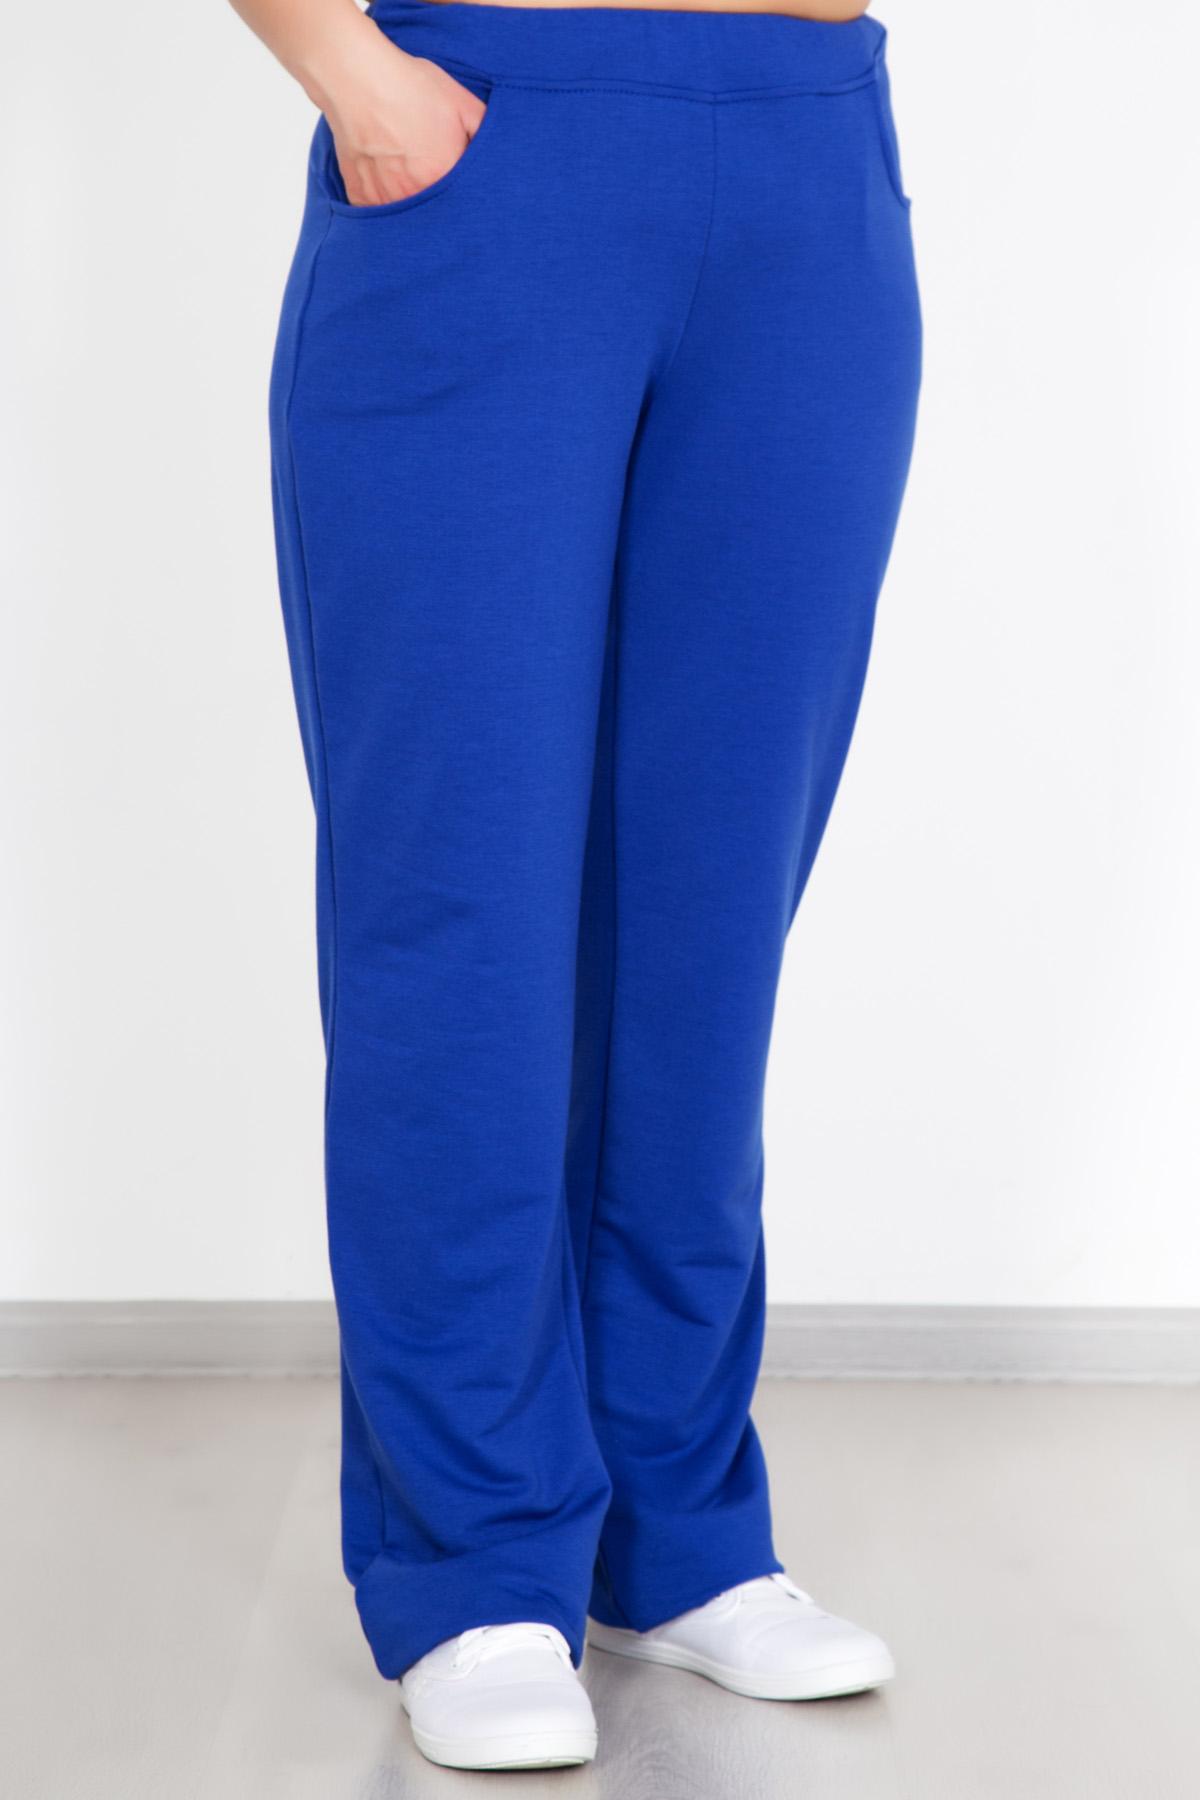 Жен. брюки арт. 18-0216 р. 58 - Женская одежда артикул: 25510